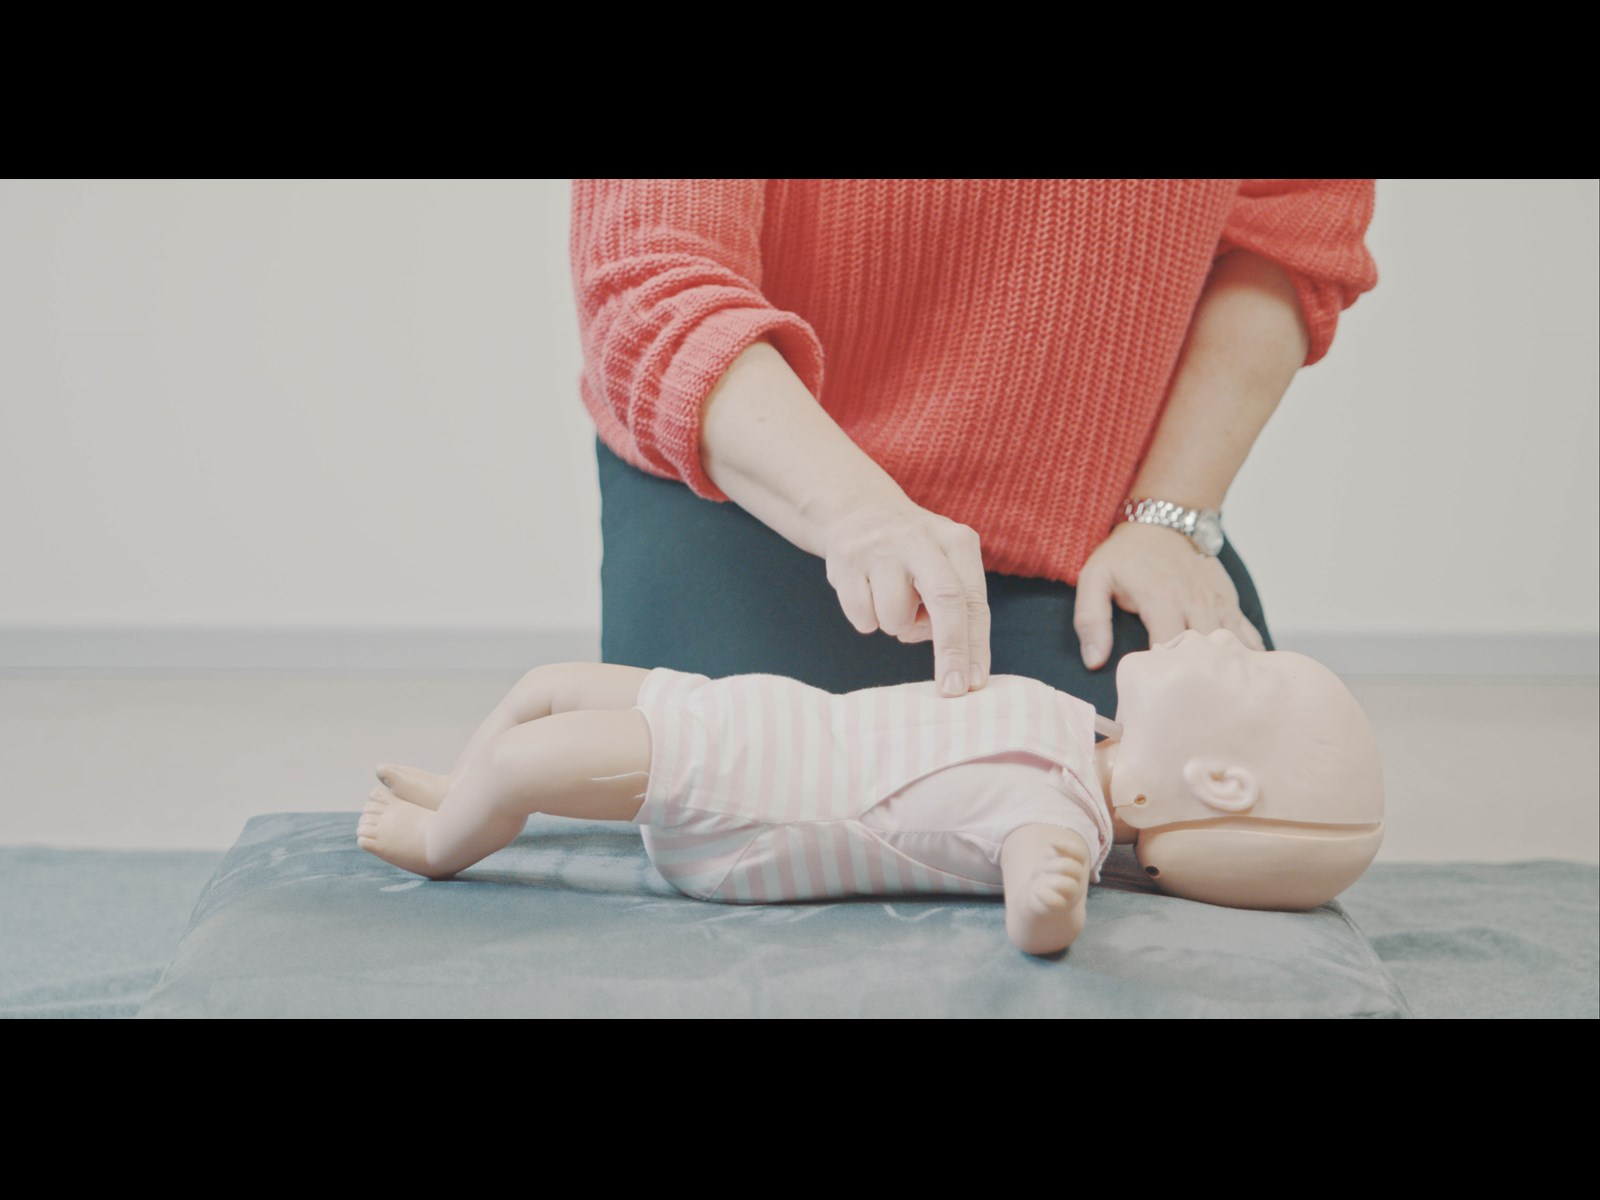 Vauvan Ensiapu